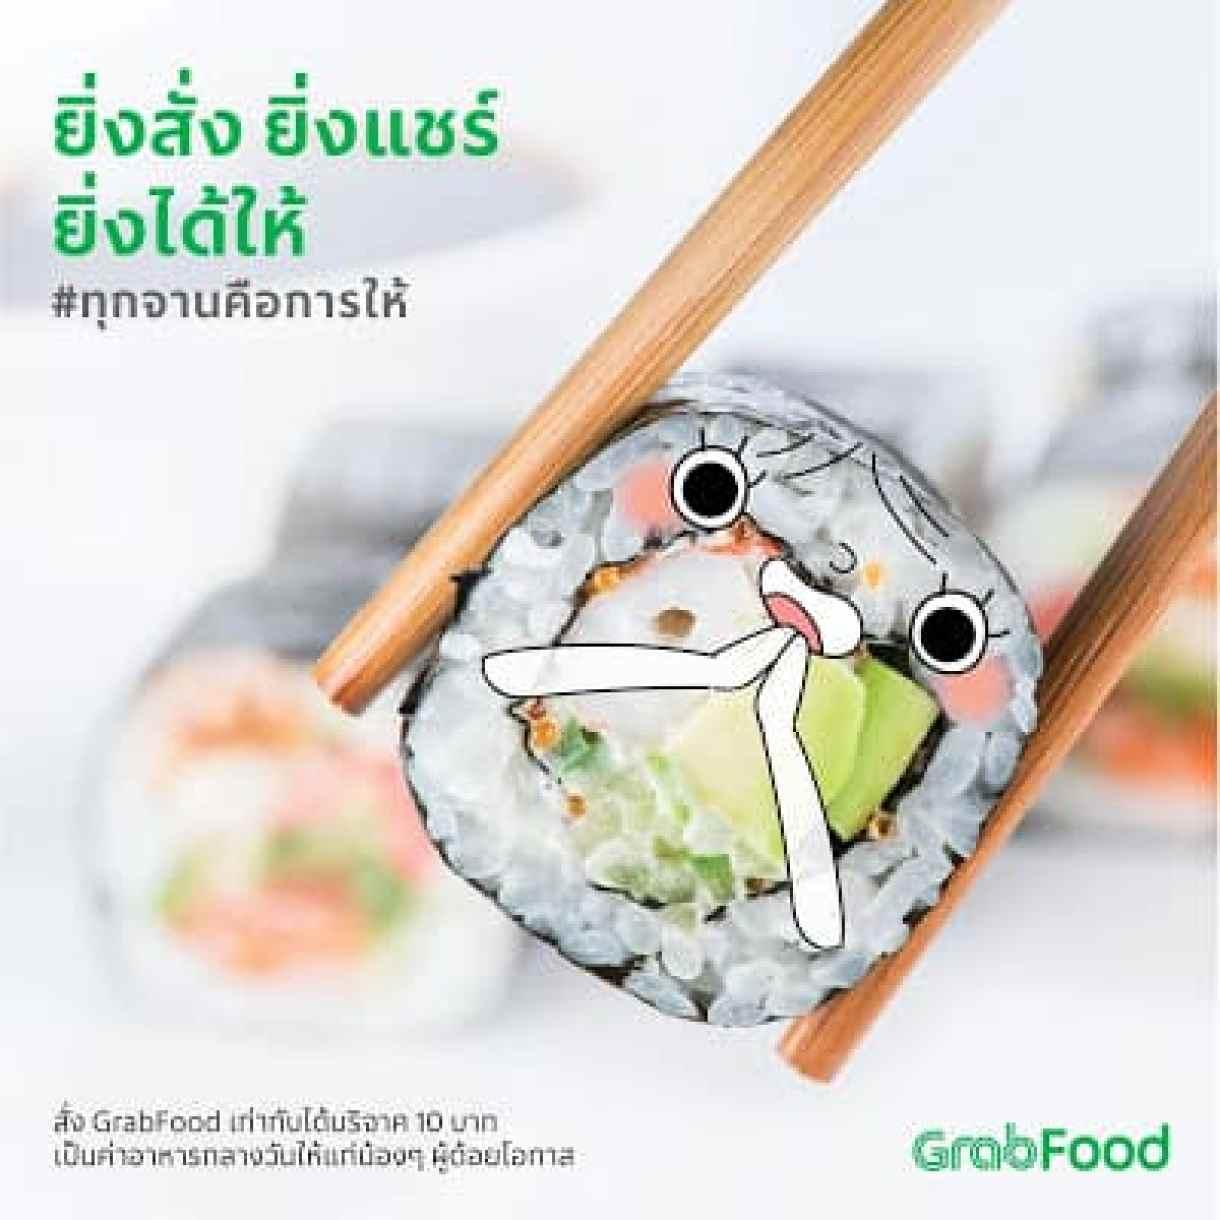 - Grab ชวนอร่อยให้น้องอิ่มในโครงการ 'GrabFood for Good ทุกจานคือการให้'  ตั้งแต่วันที่ 15 – 30 มิถุนายน 2561